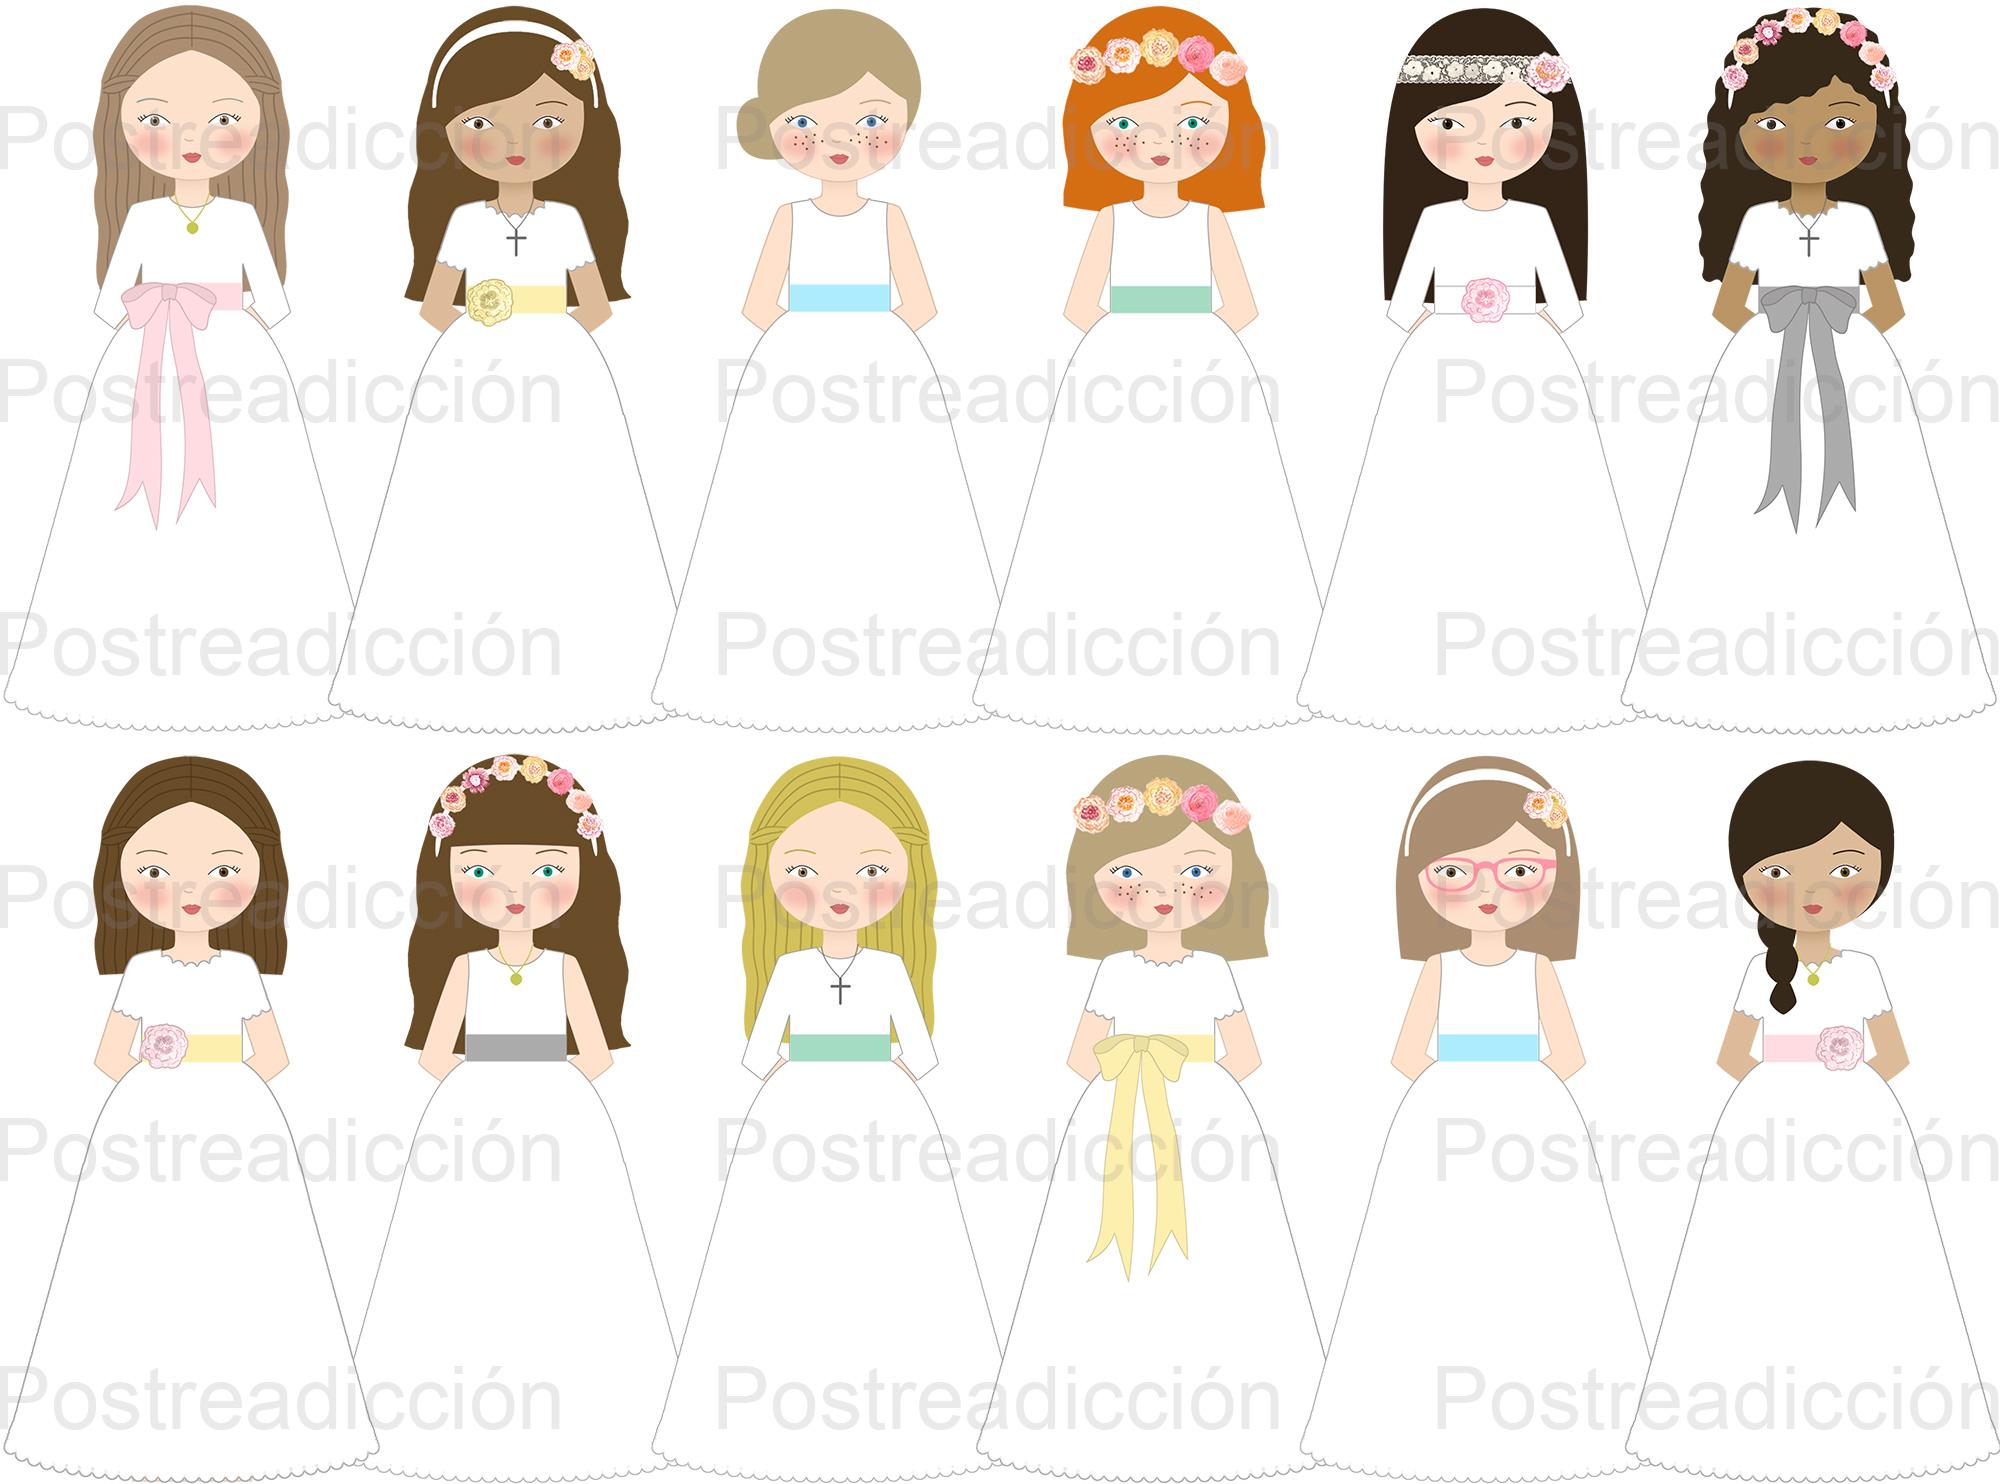 Imagen de producto: https://tienda.postreadiccion.com/img/articulos/secundarias14020-kit-imprimible-de-comunion-carlota-liberty-felicite-b-1.jpg